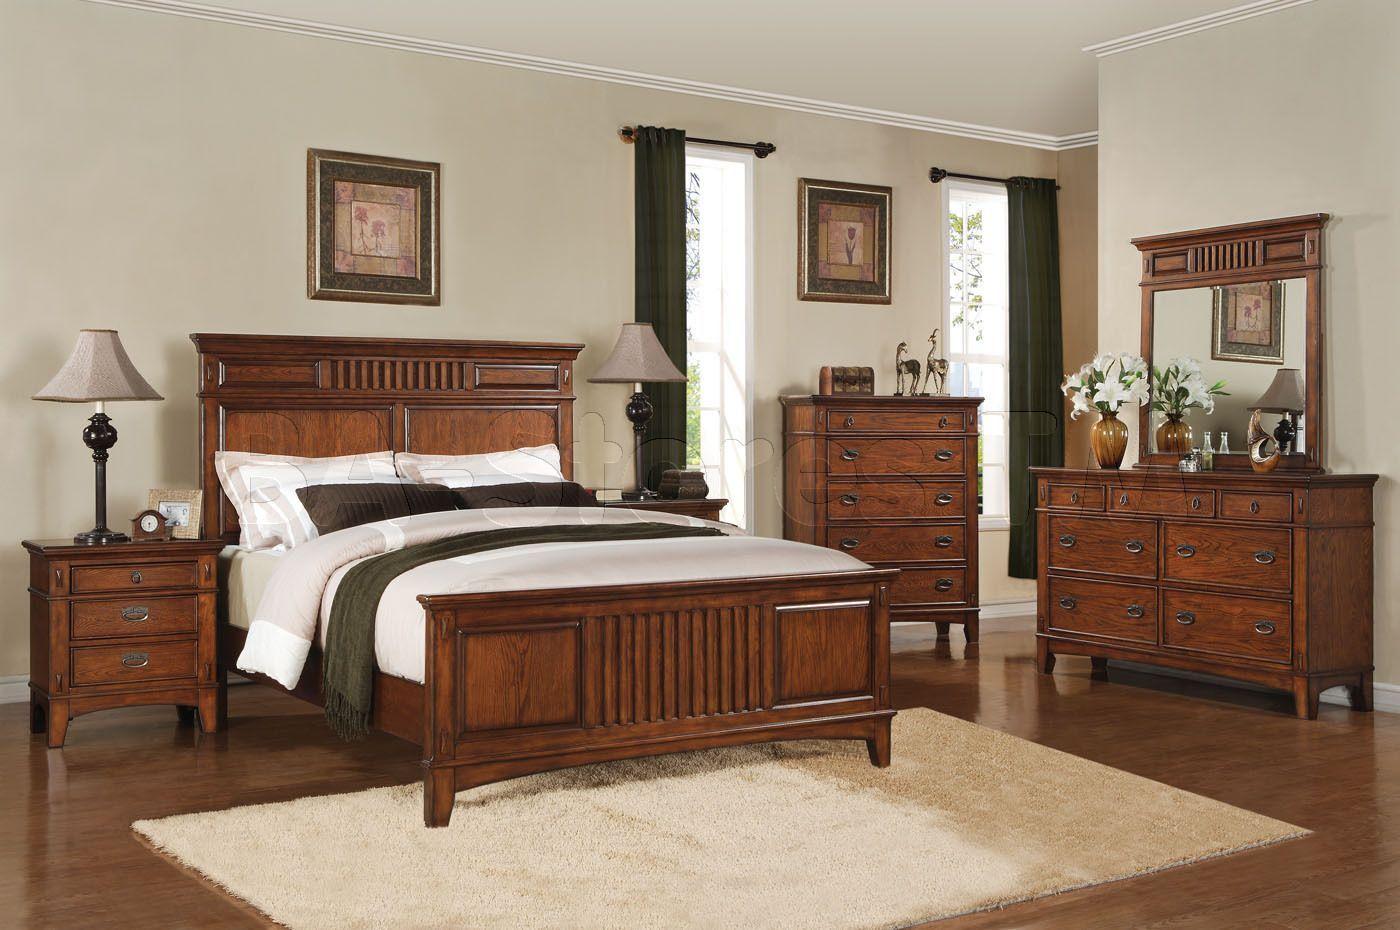 42++ Bedroom ideas with teak furniture info